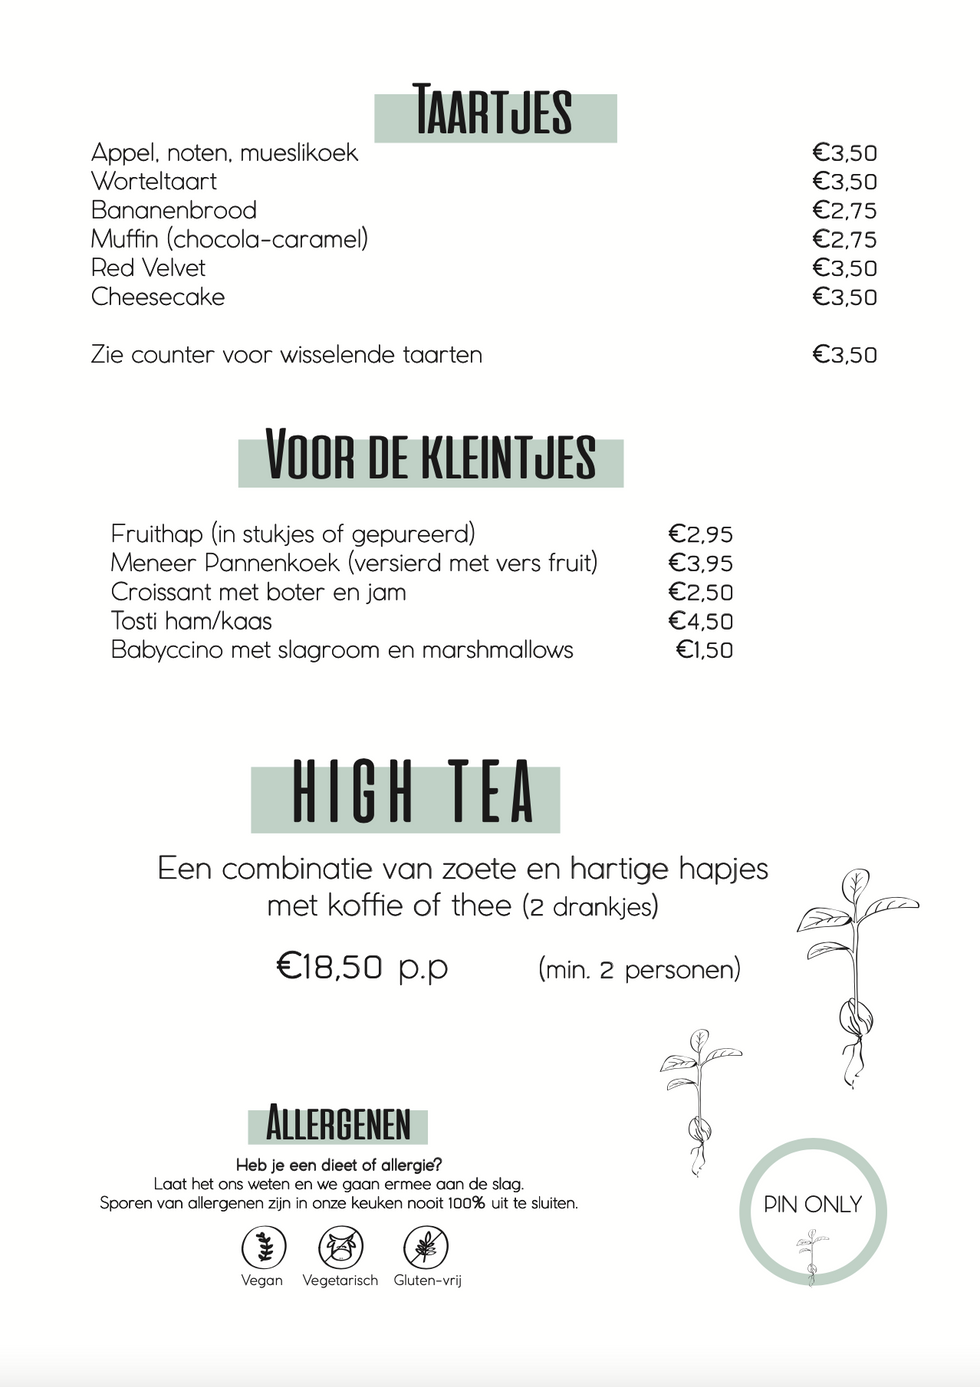 Taartjes, kleintjes, high tea.png